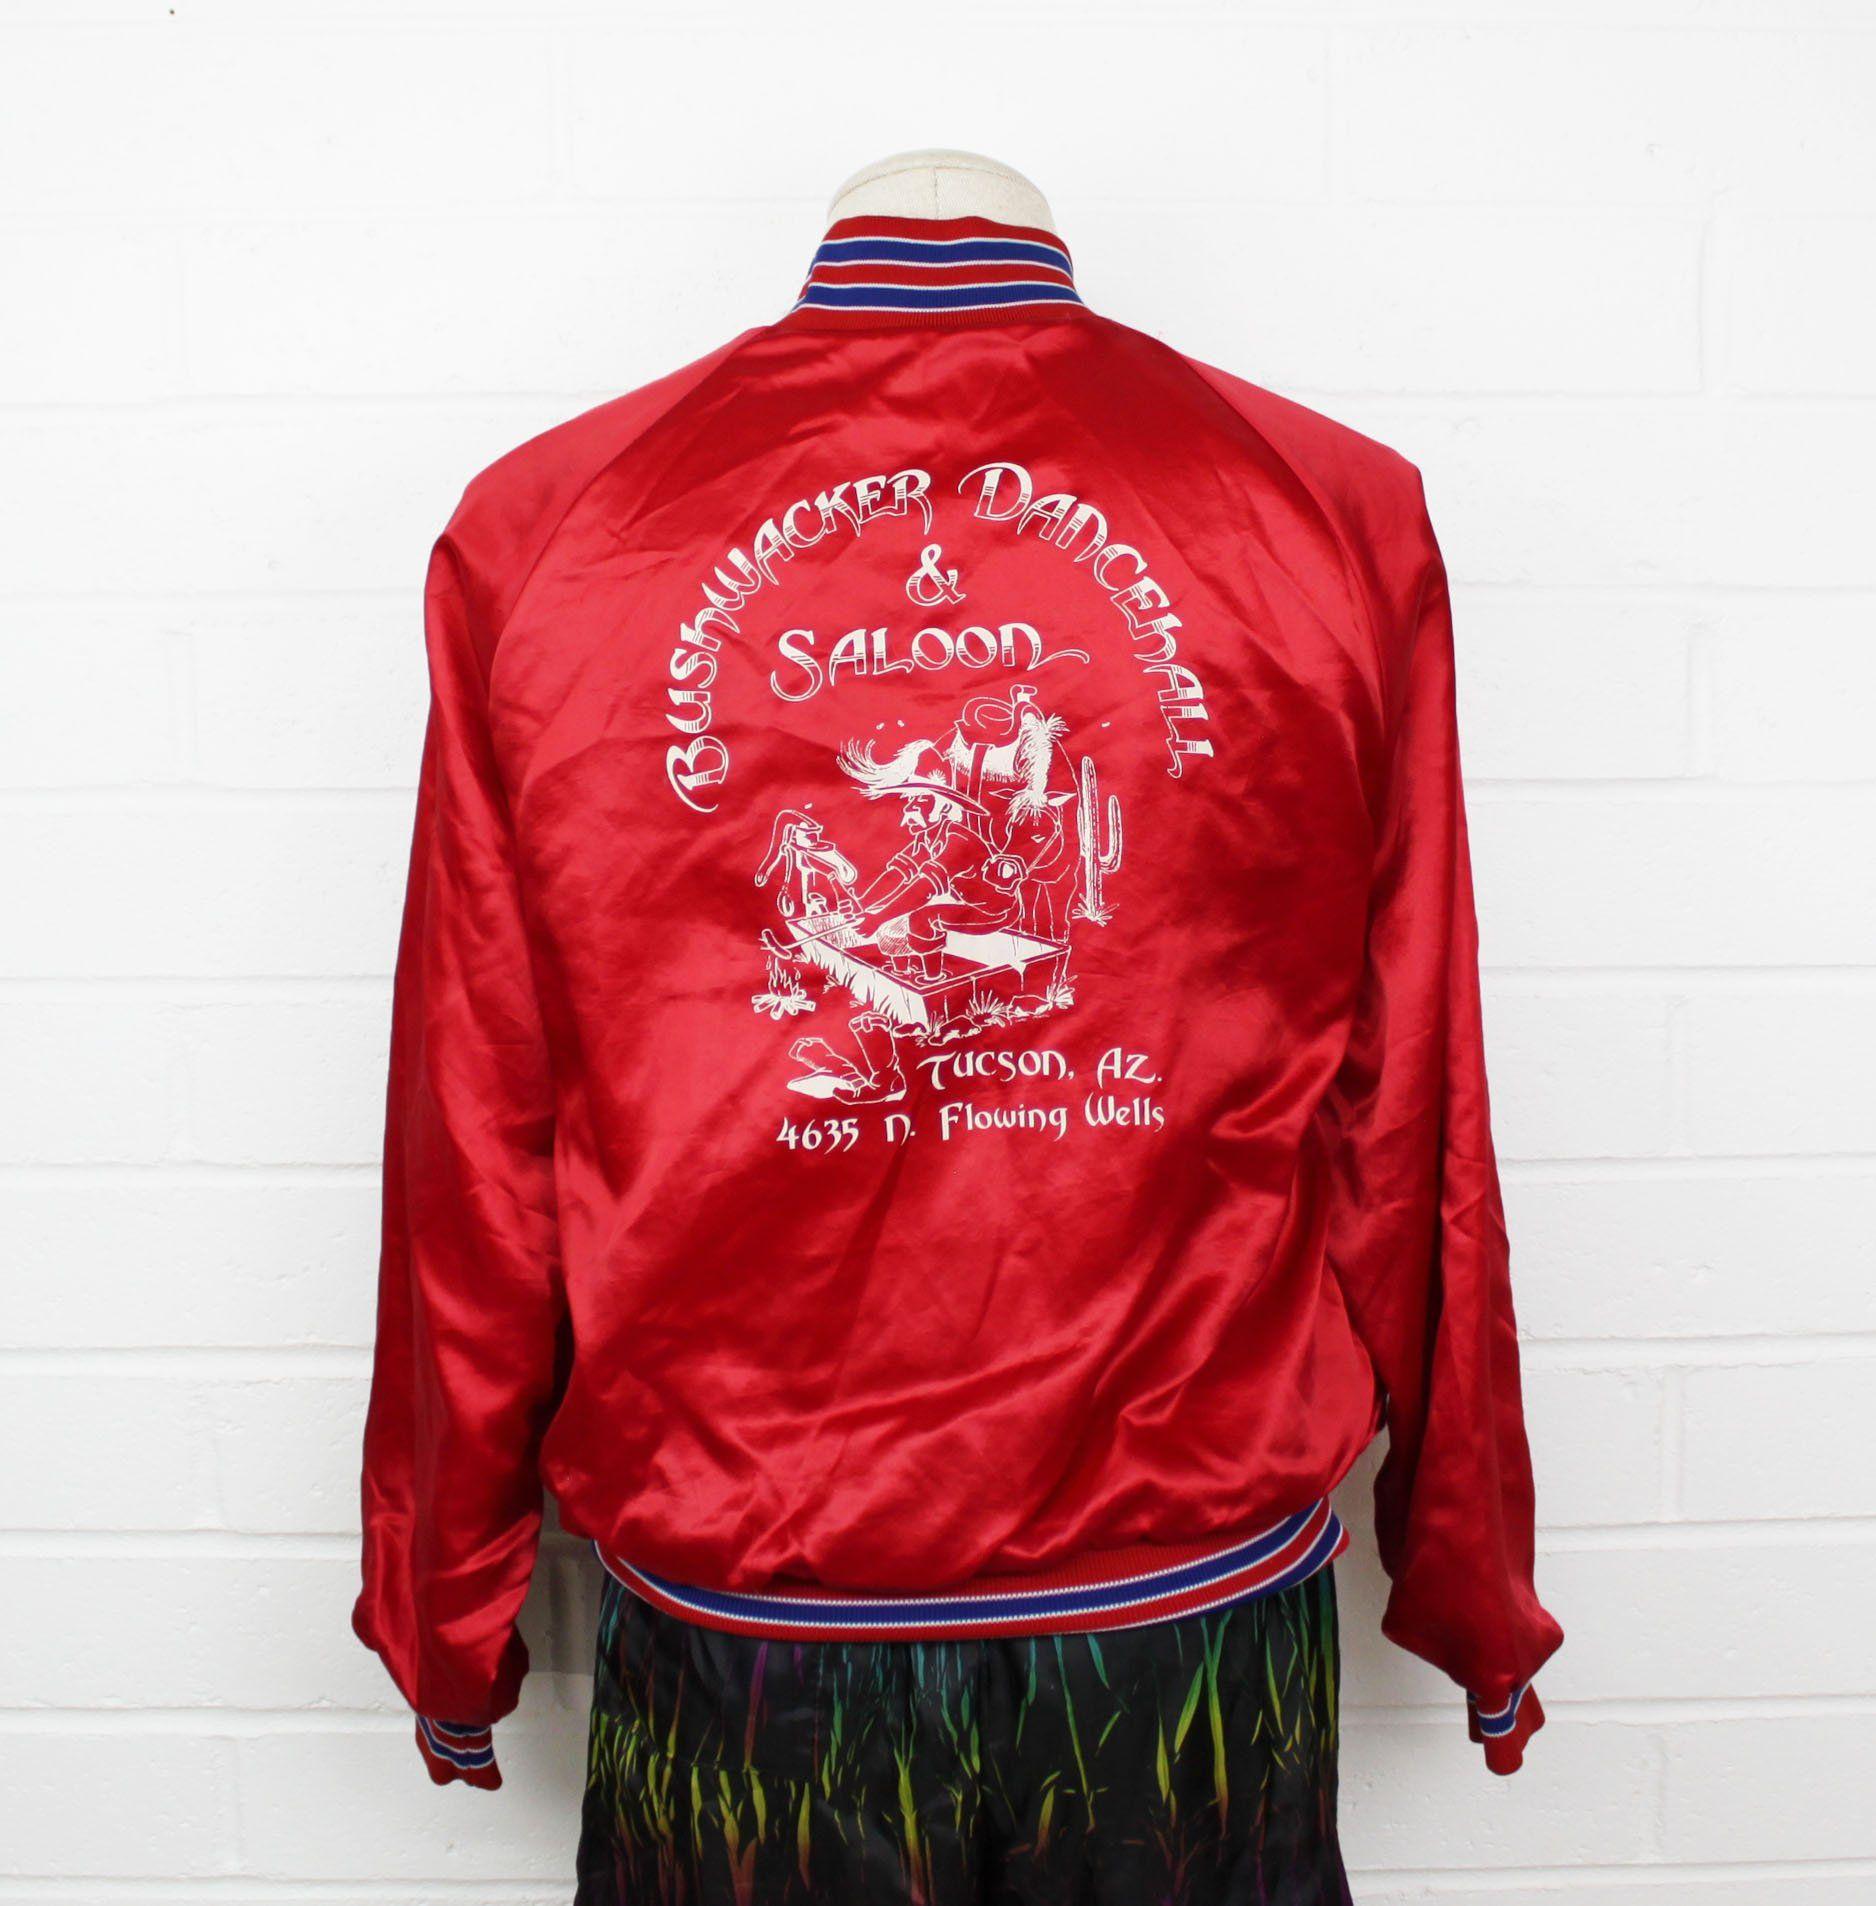 Vintage 80s Red Satin Jacket Large Saloon Dancehall Tucson Etsy Satin Jackets Jackets Satin Bomber Jacket [ 1906 x 1876 Pixel ]